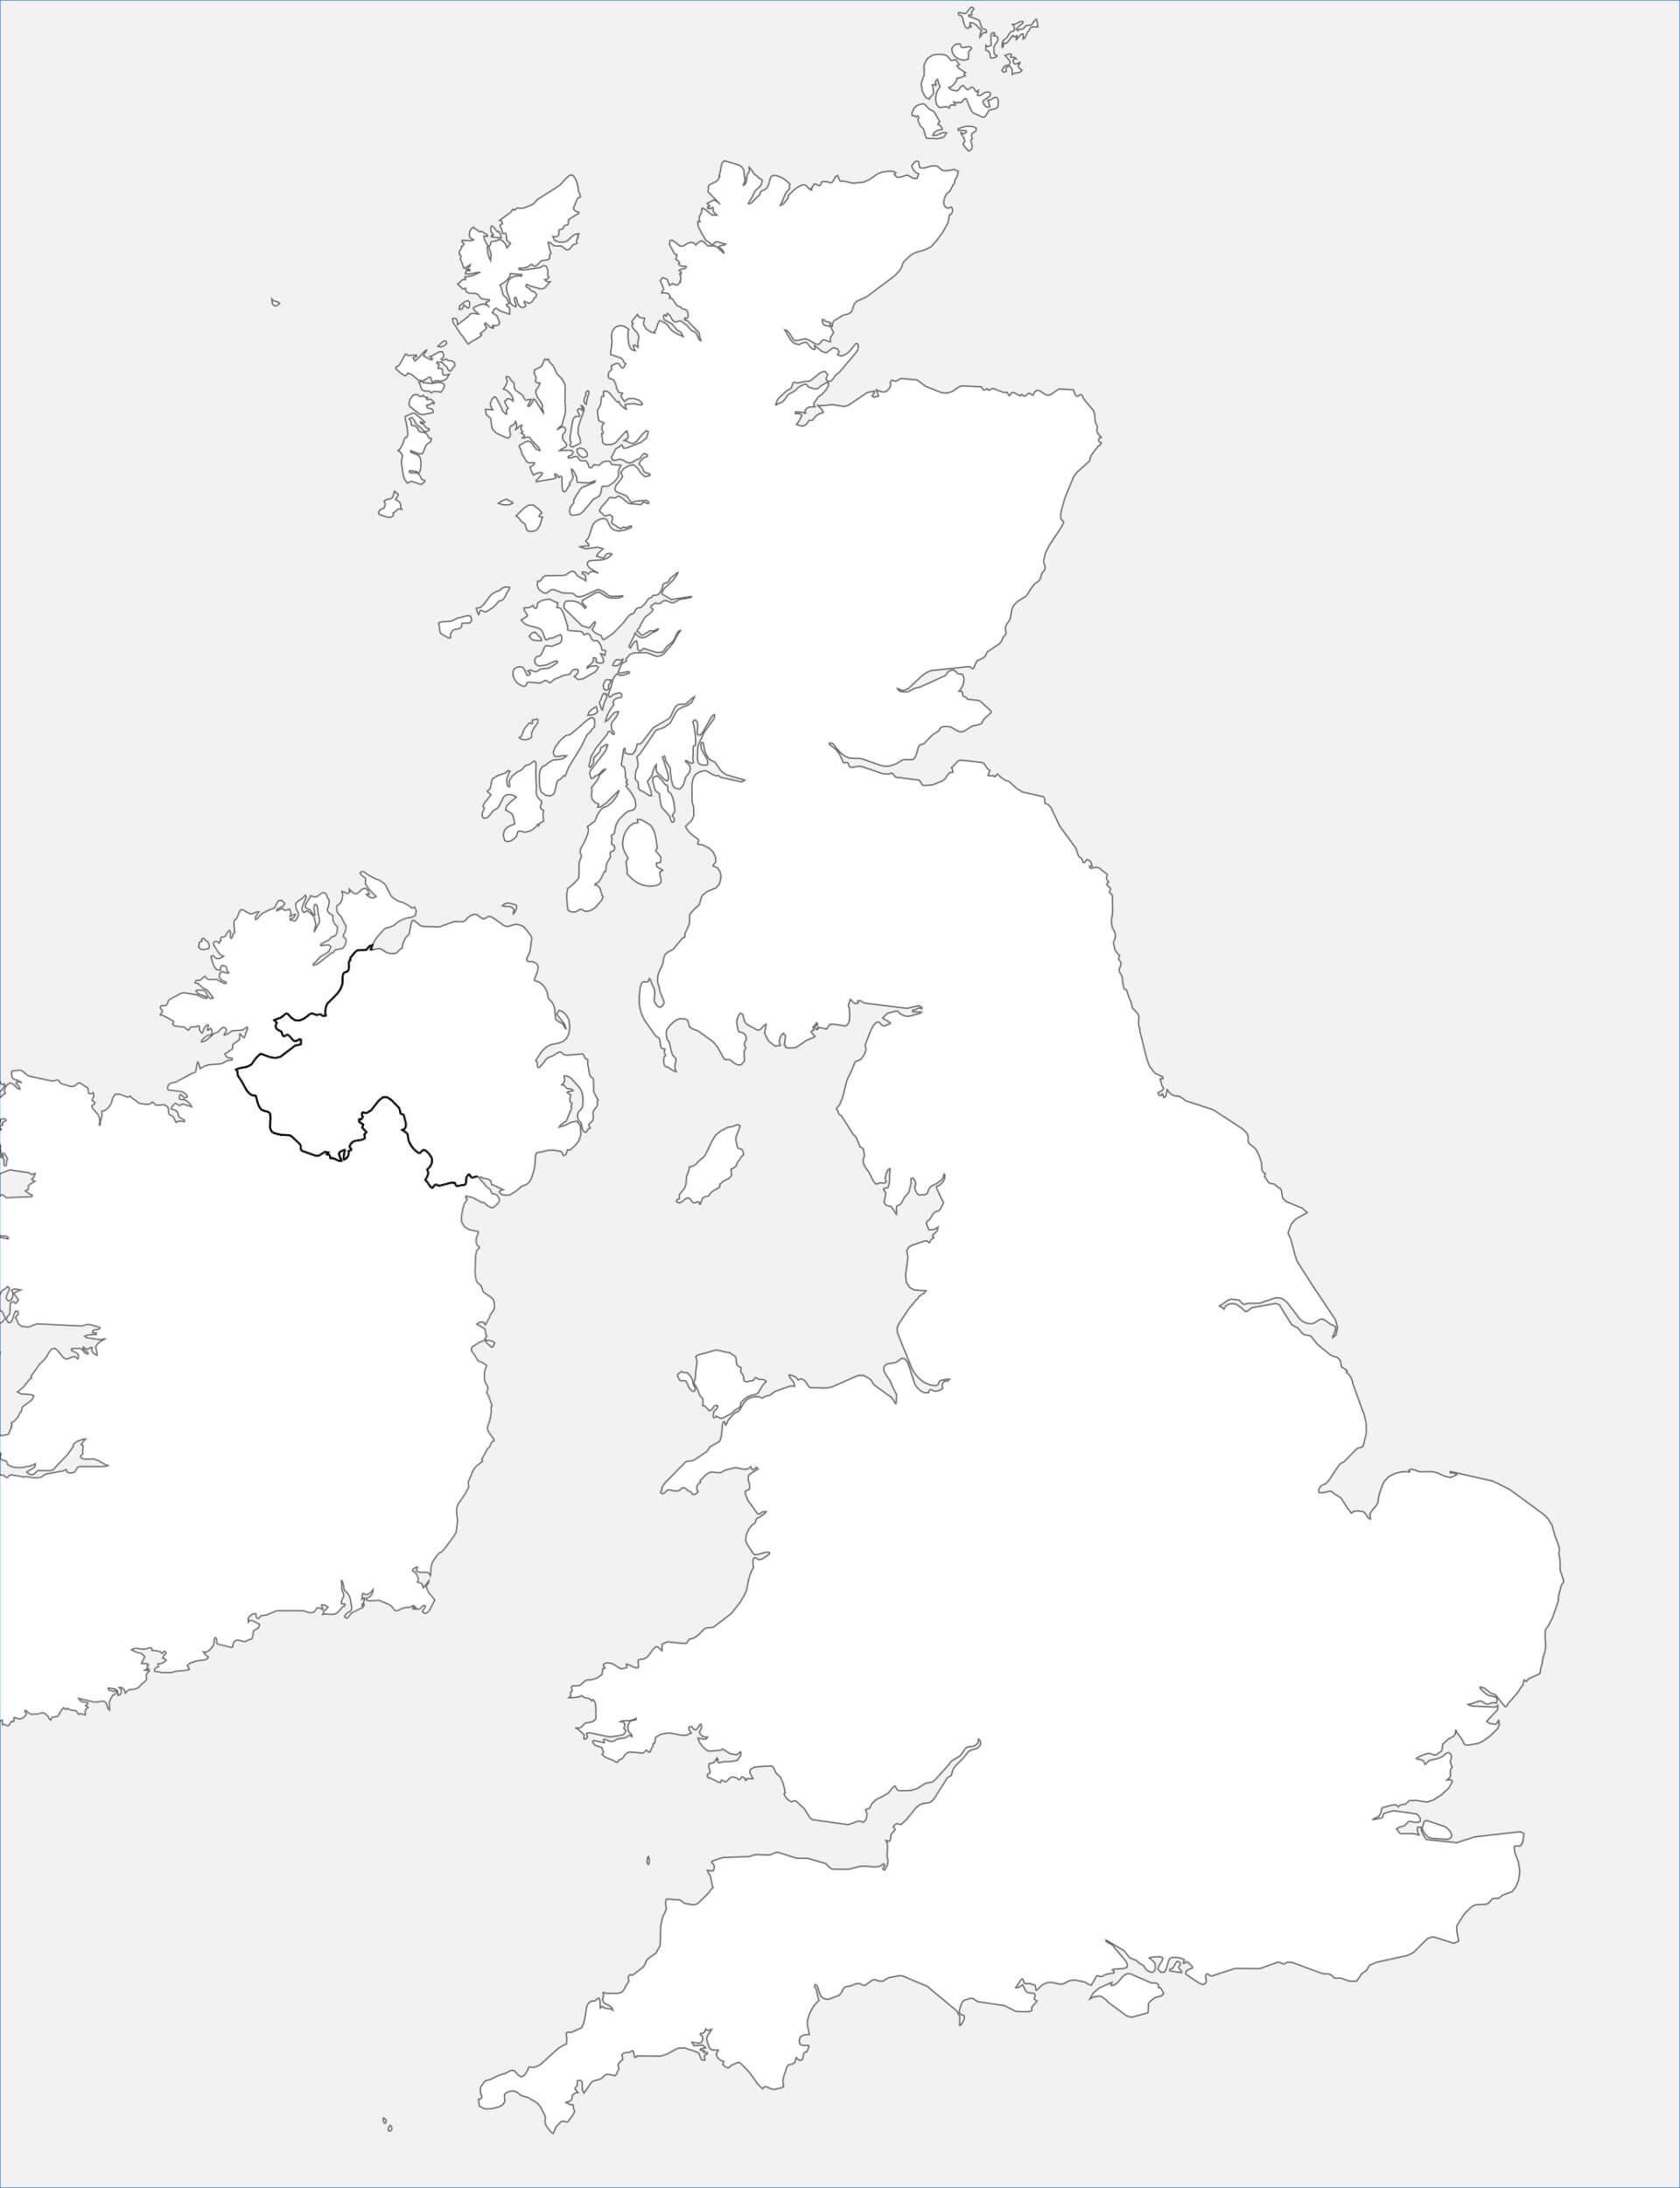 carte du royaume uni vierge Carte du Royaume Uni